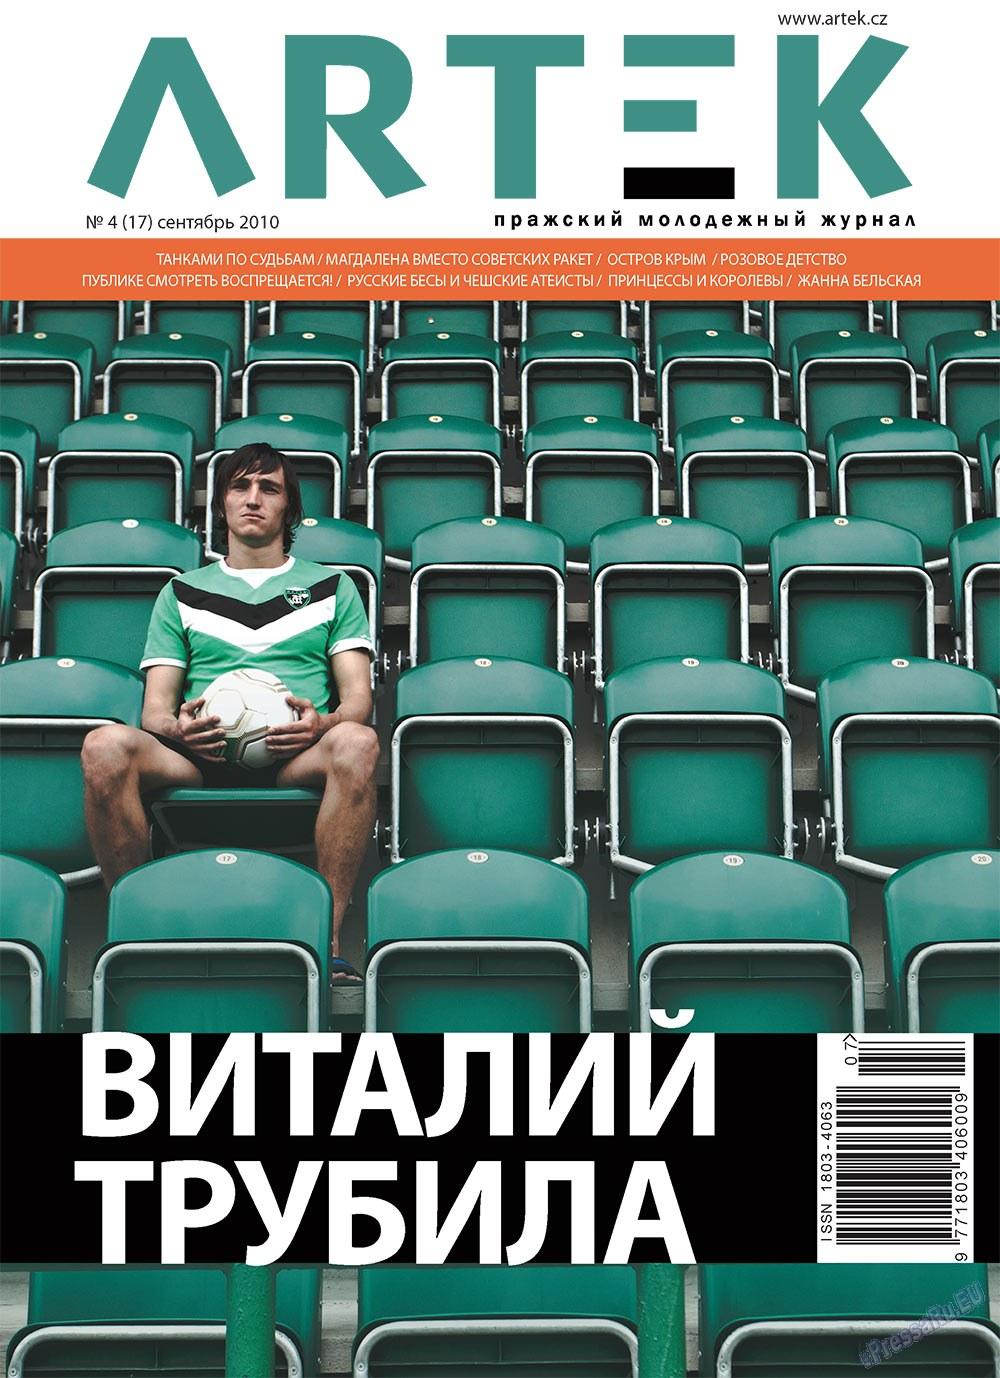 Артек (журнал). 2010 год, номер 4, стр. 1